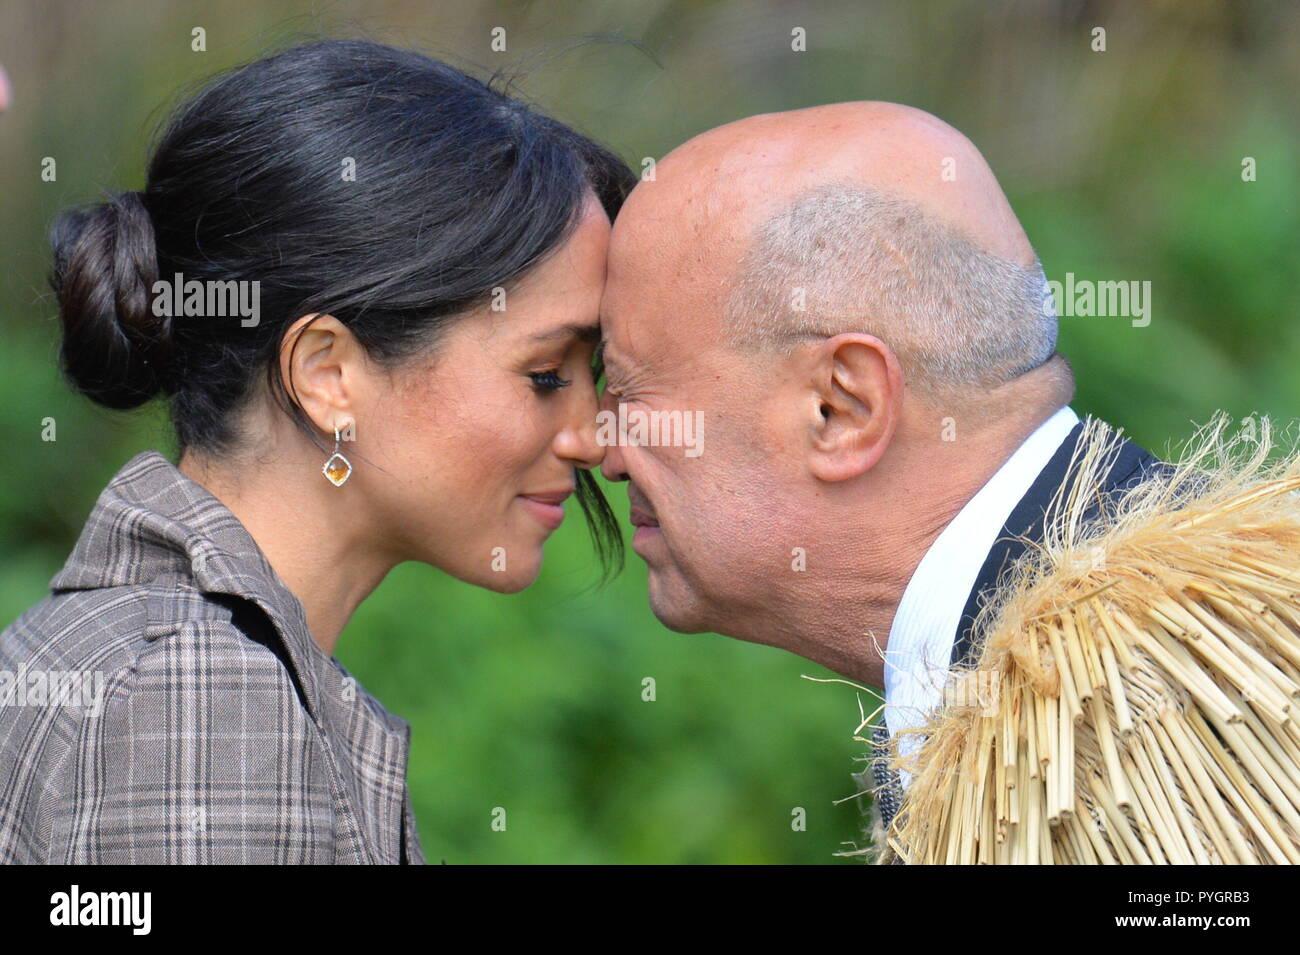 Maori Greeting Hongi: The Duchess Of Sussex Receives A Hongi, A Traditional